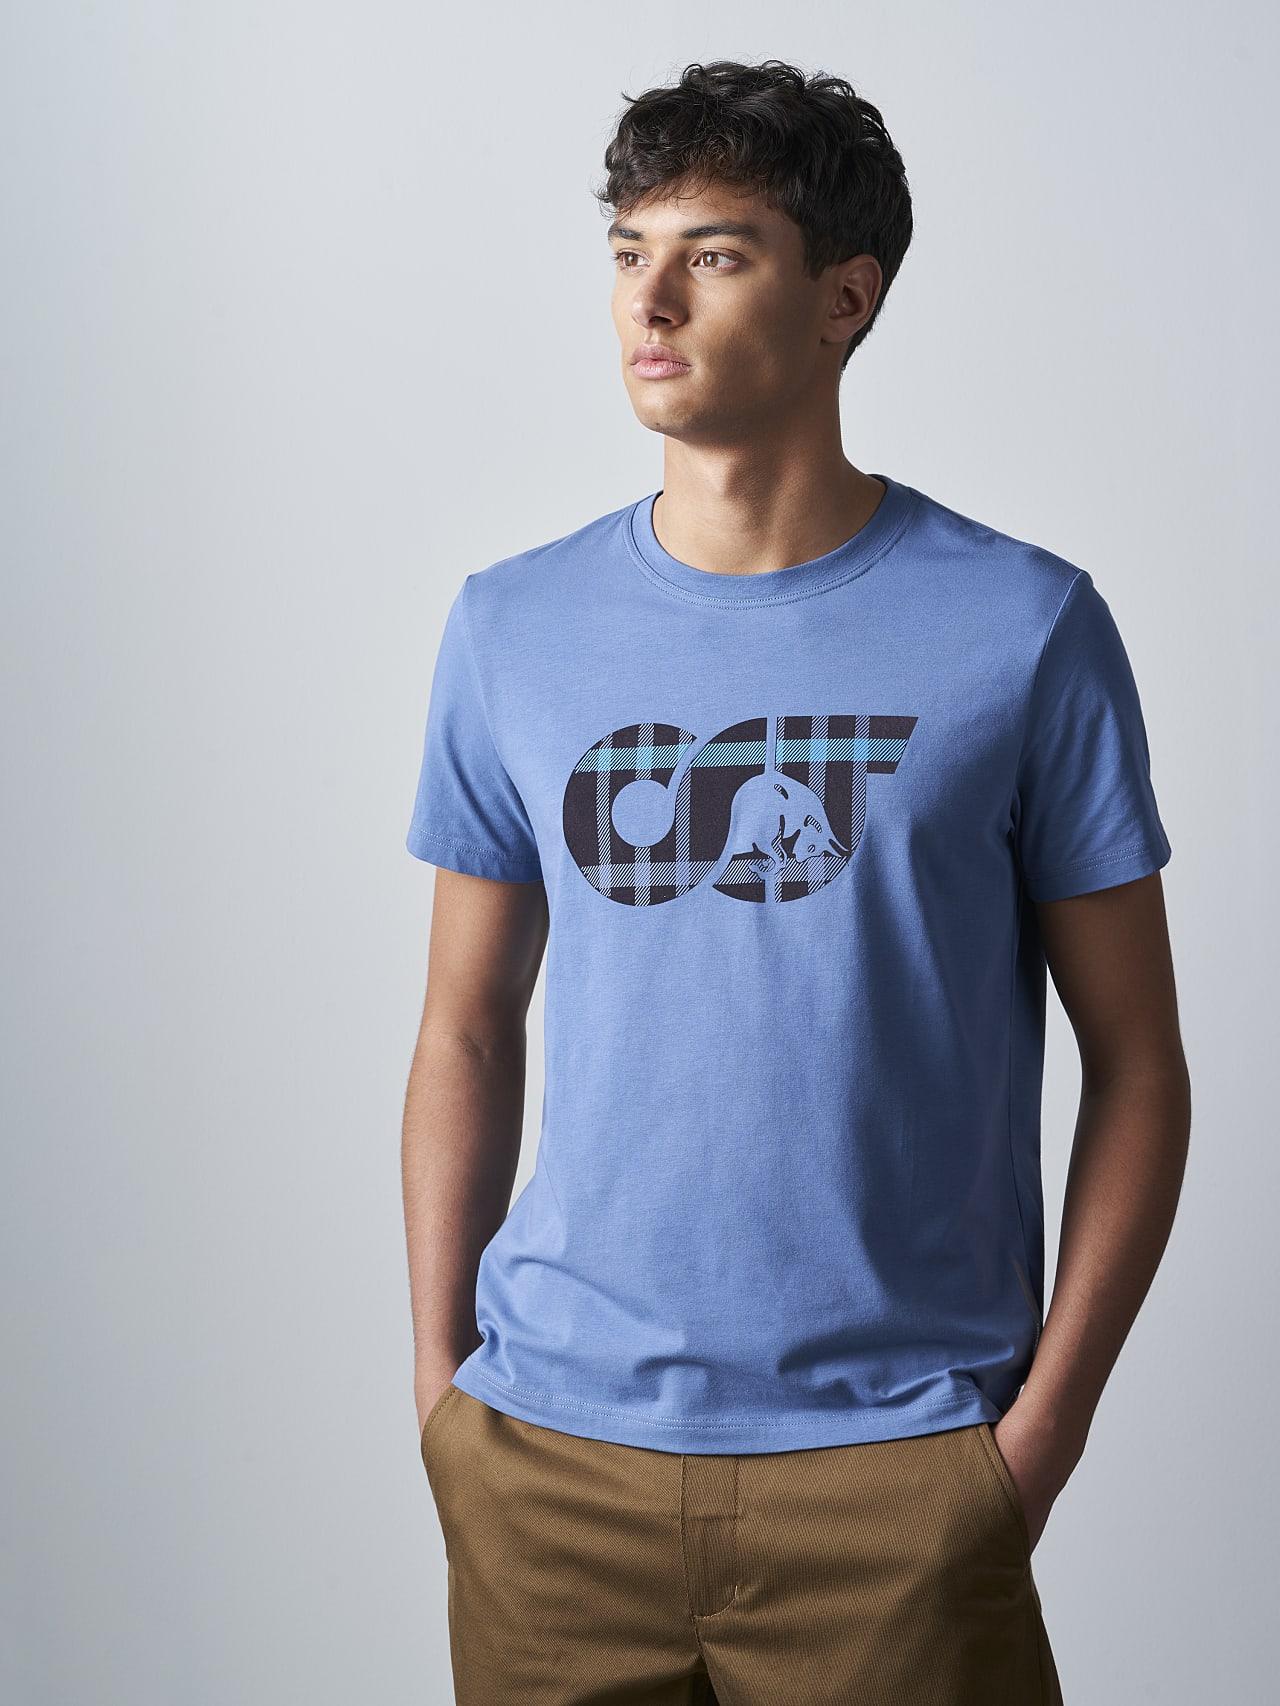 JABIS V1.Y5.02 Logo Print T-Shirt light blue Model shot Alpha Tauri